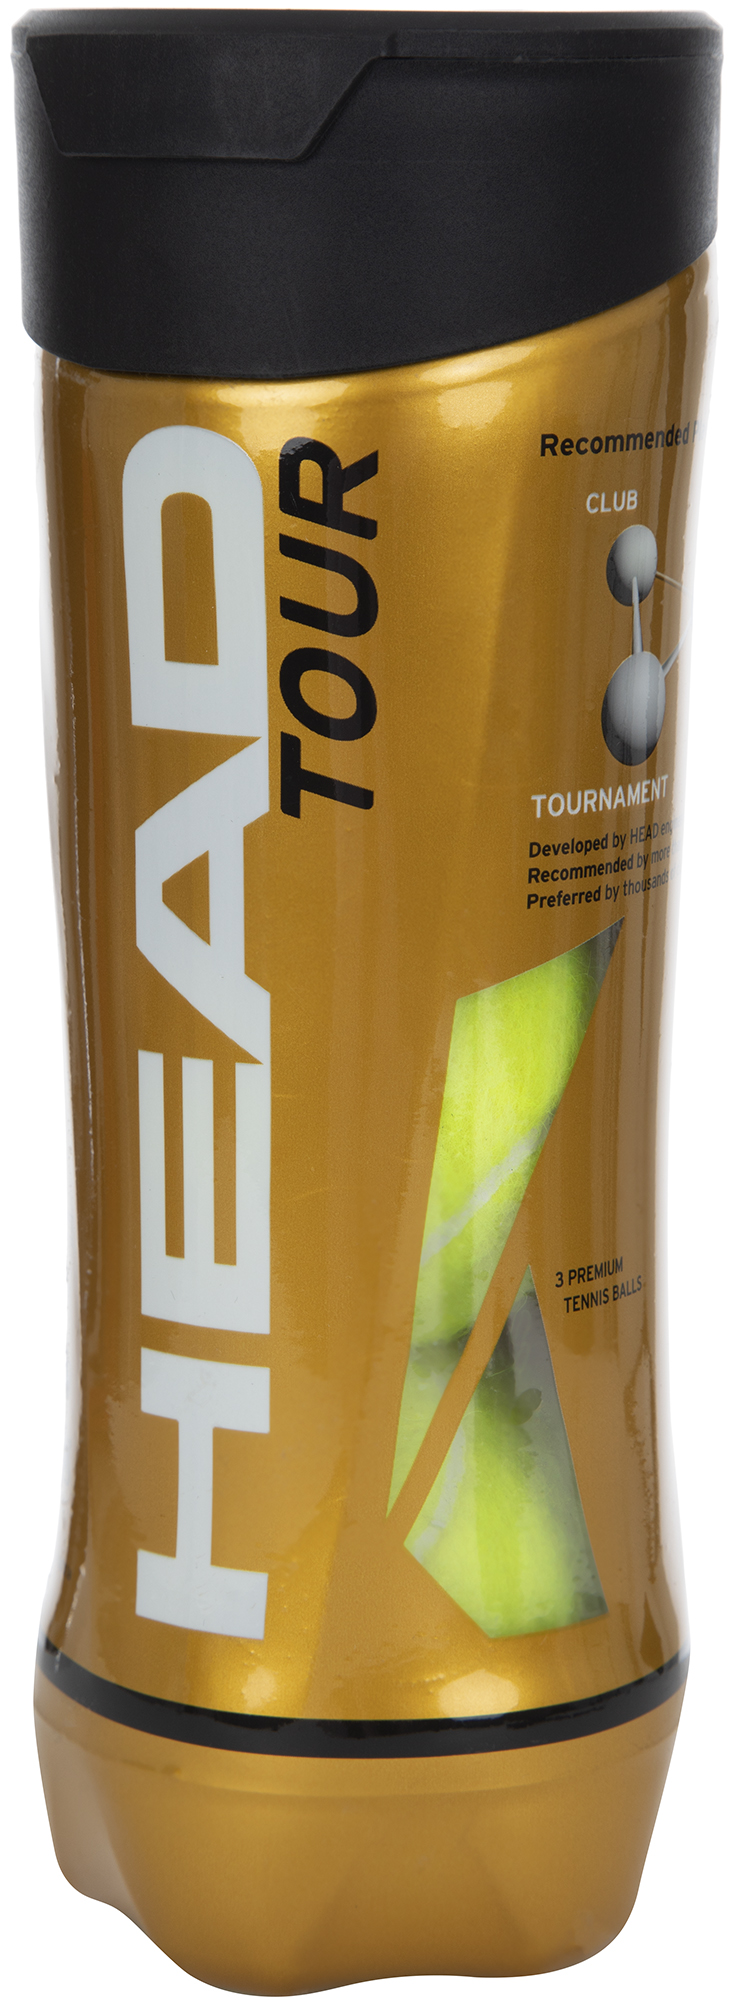 Head Набор мячей для большого тенниса Head Tour head рюкзак tour team